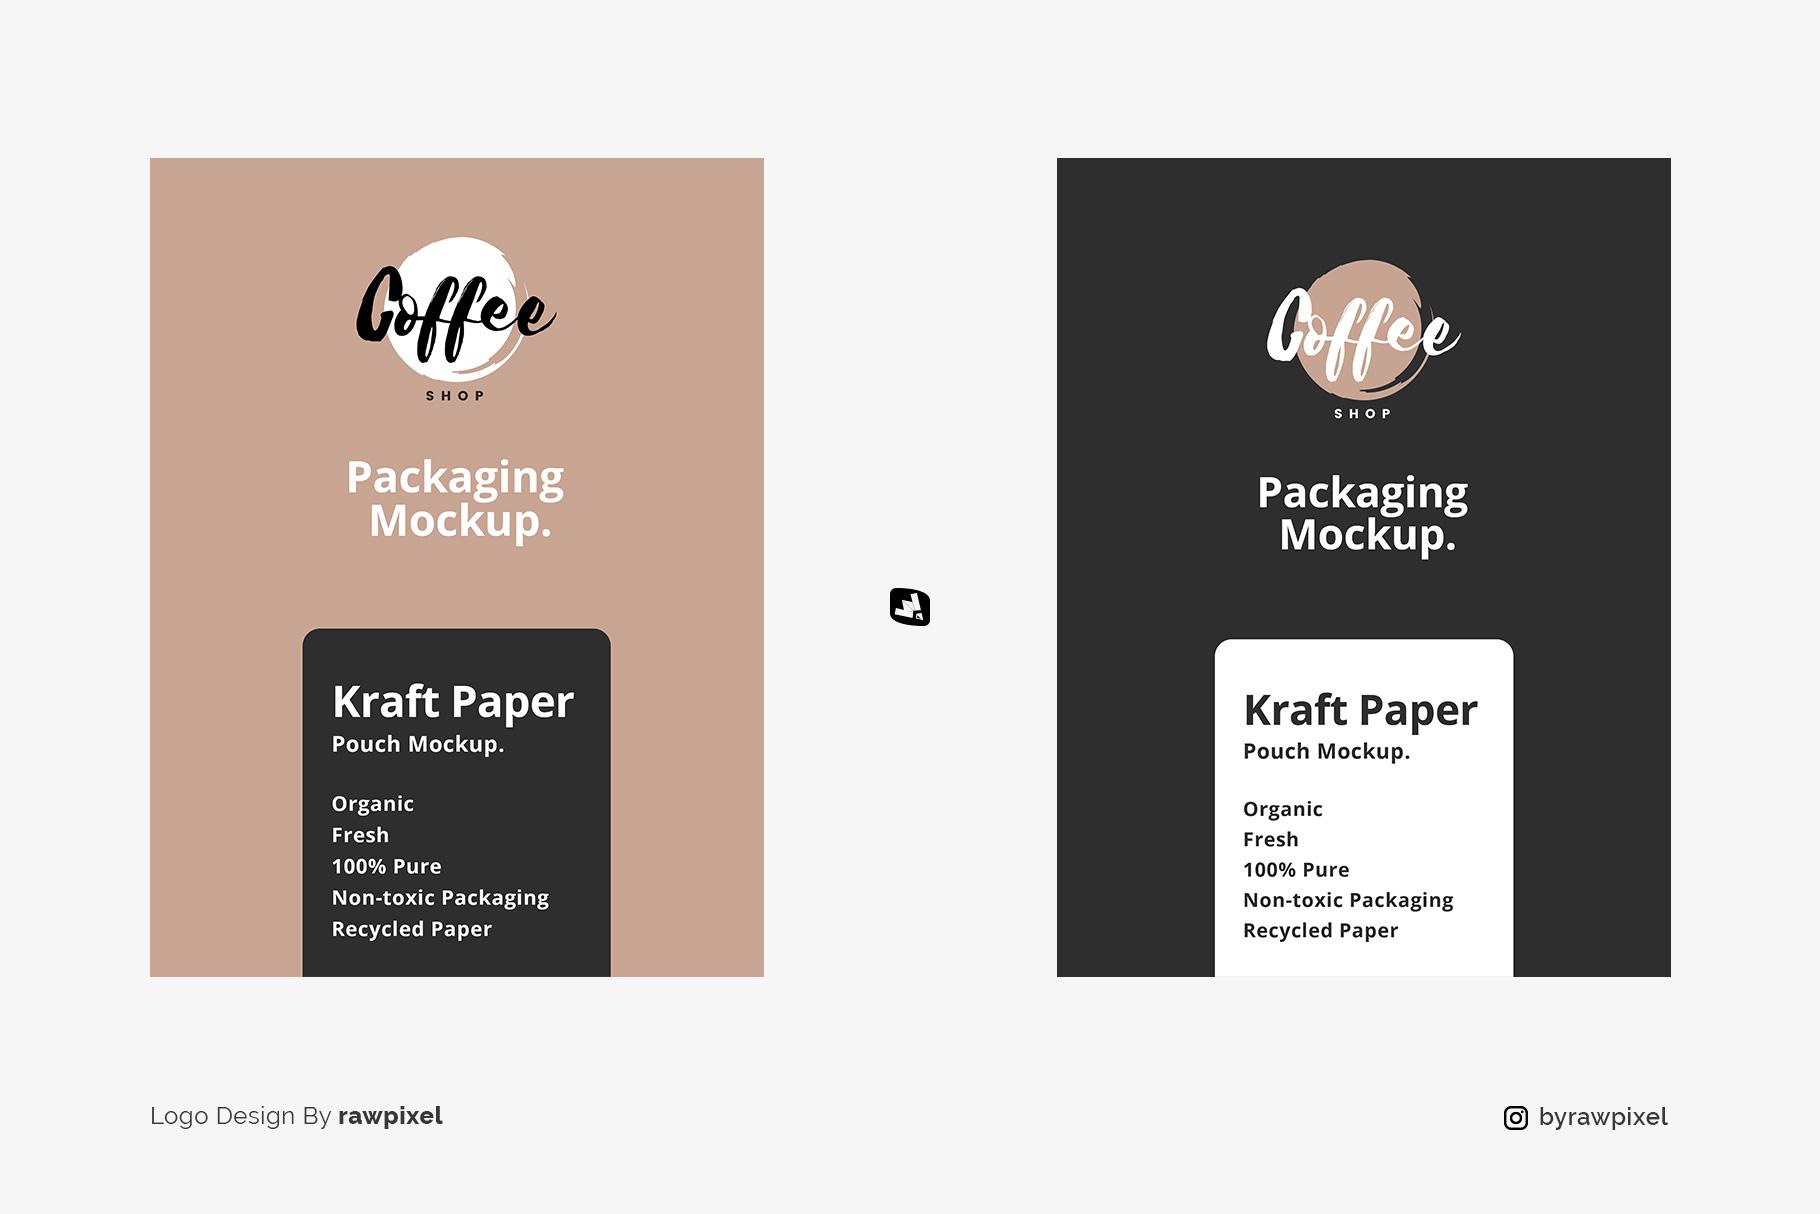 designer's credit of the tall kraft paper packaging mockup